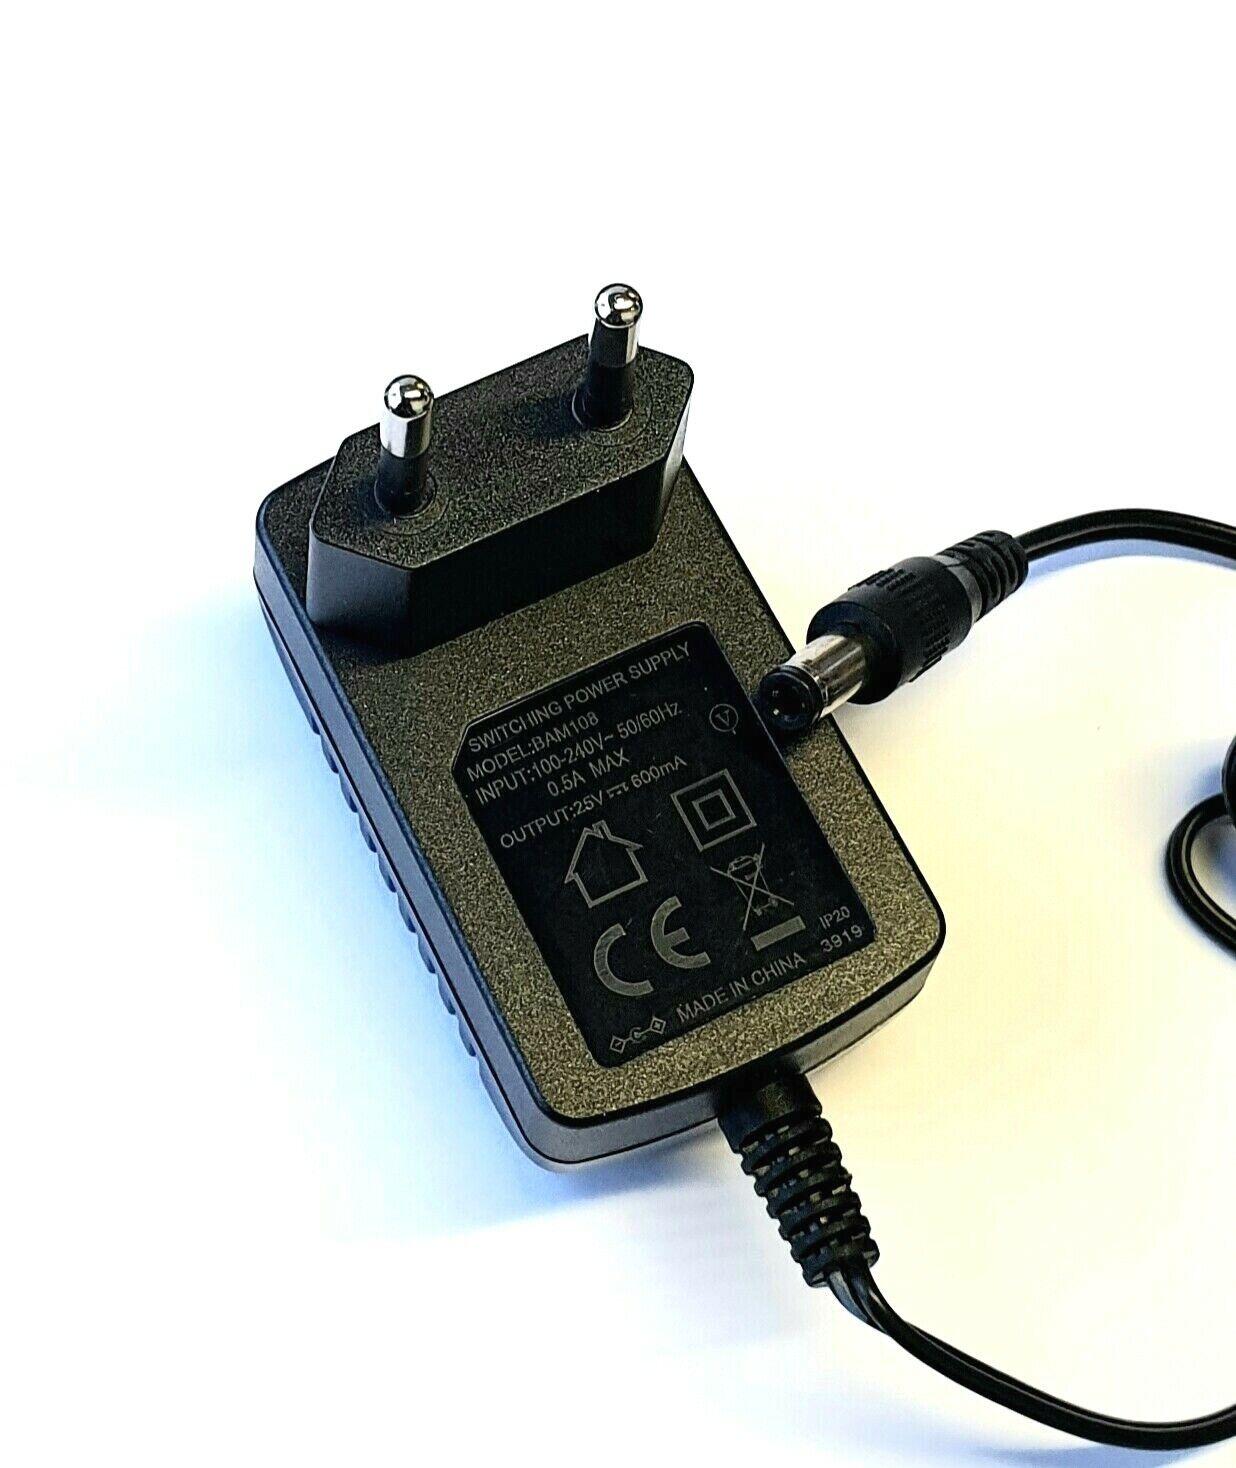 Véritable Hoover Freedom FD22 FD22G sans fil Aspirateur Filtre Lavable T113 35601731